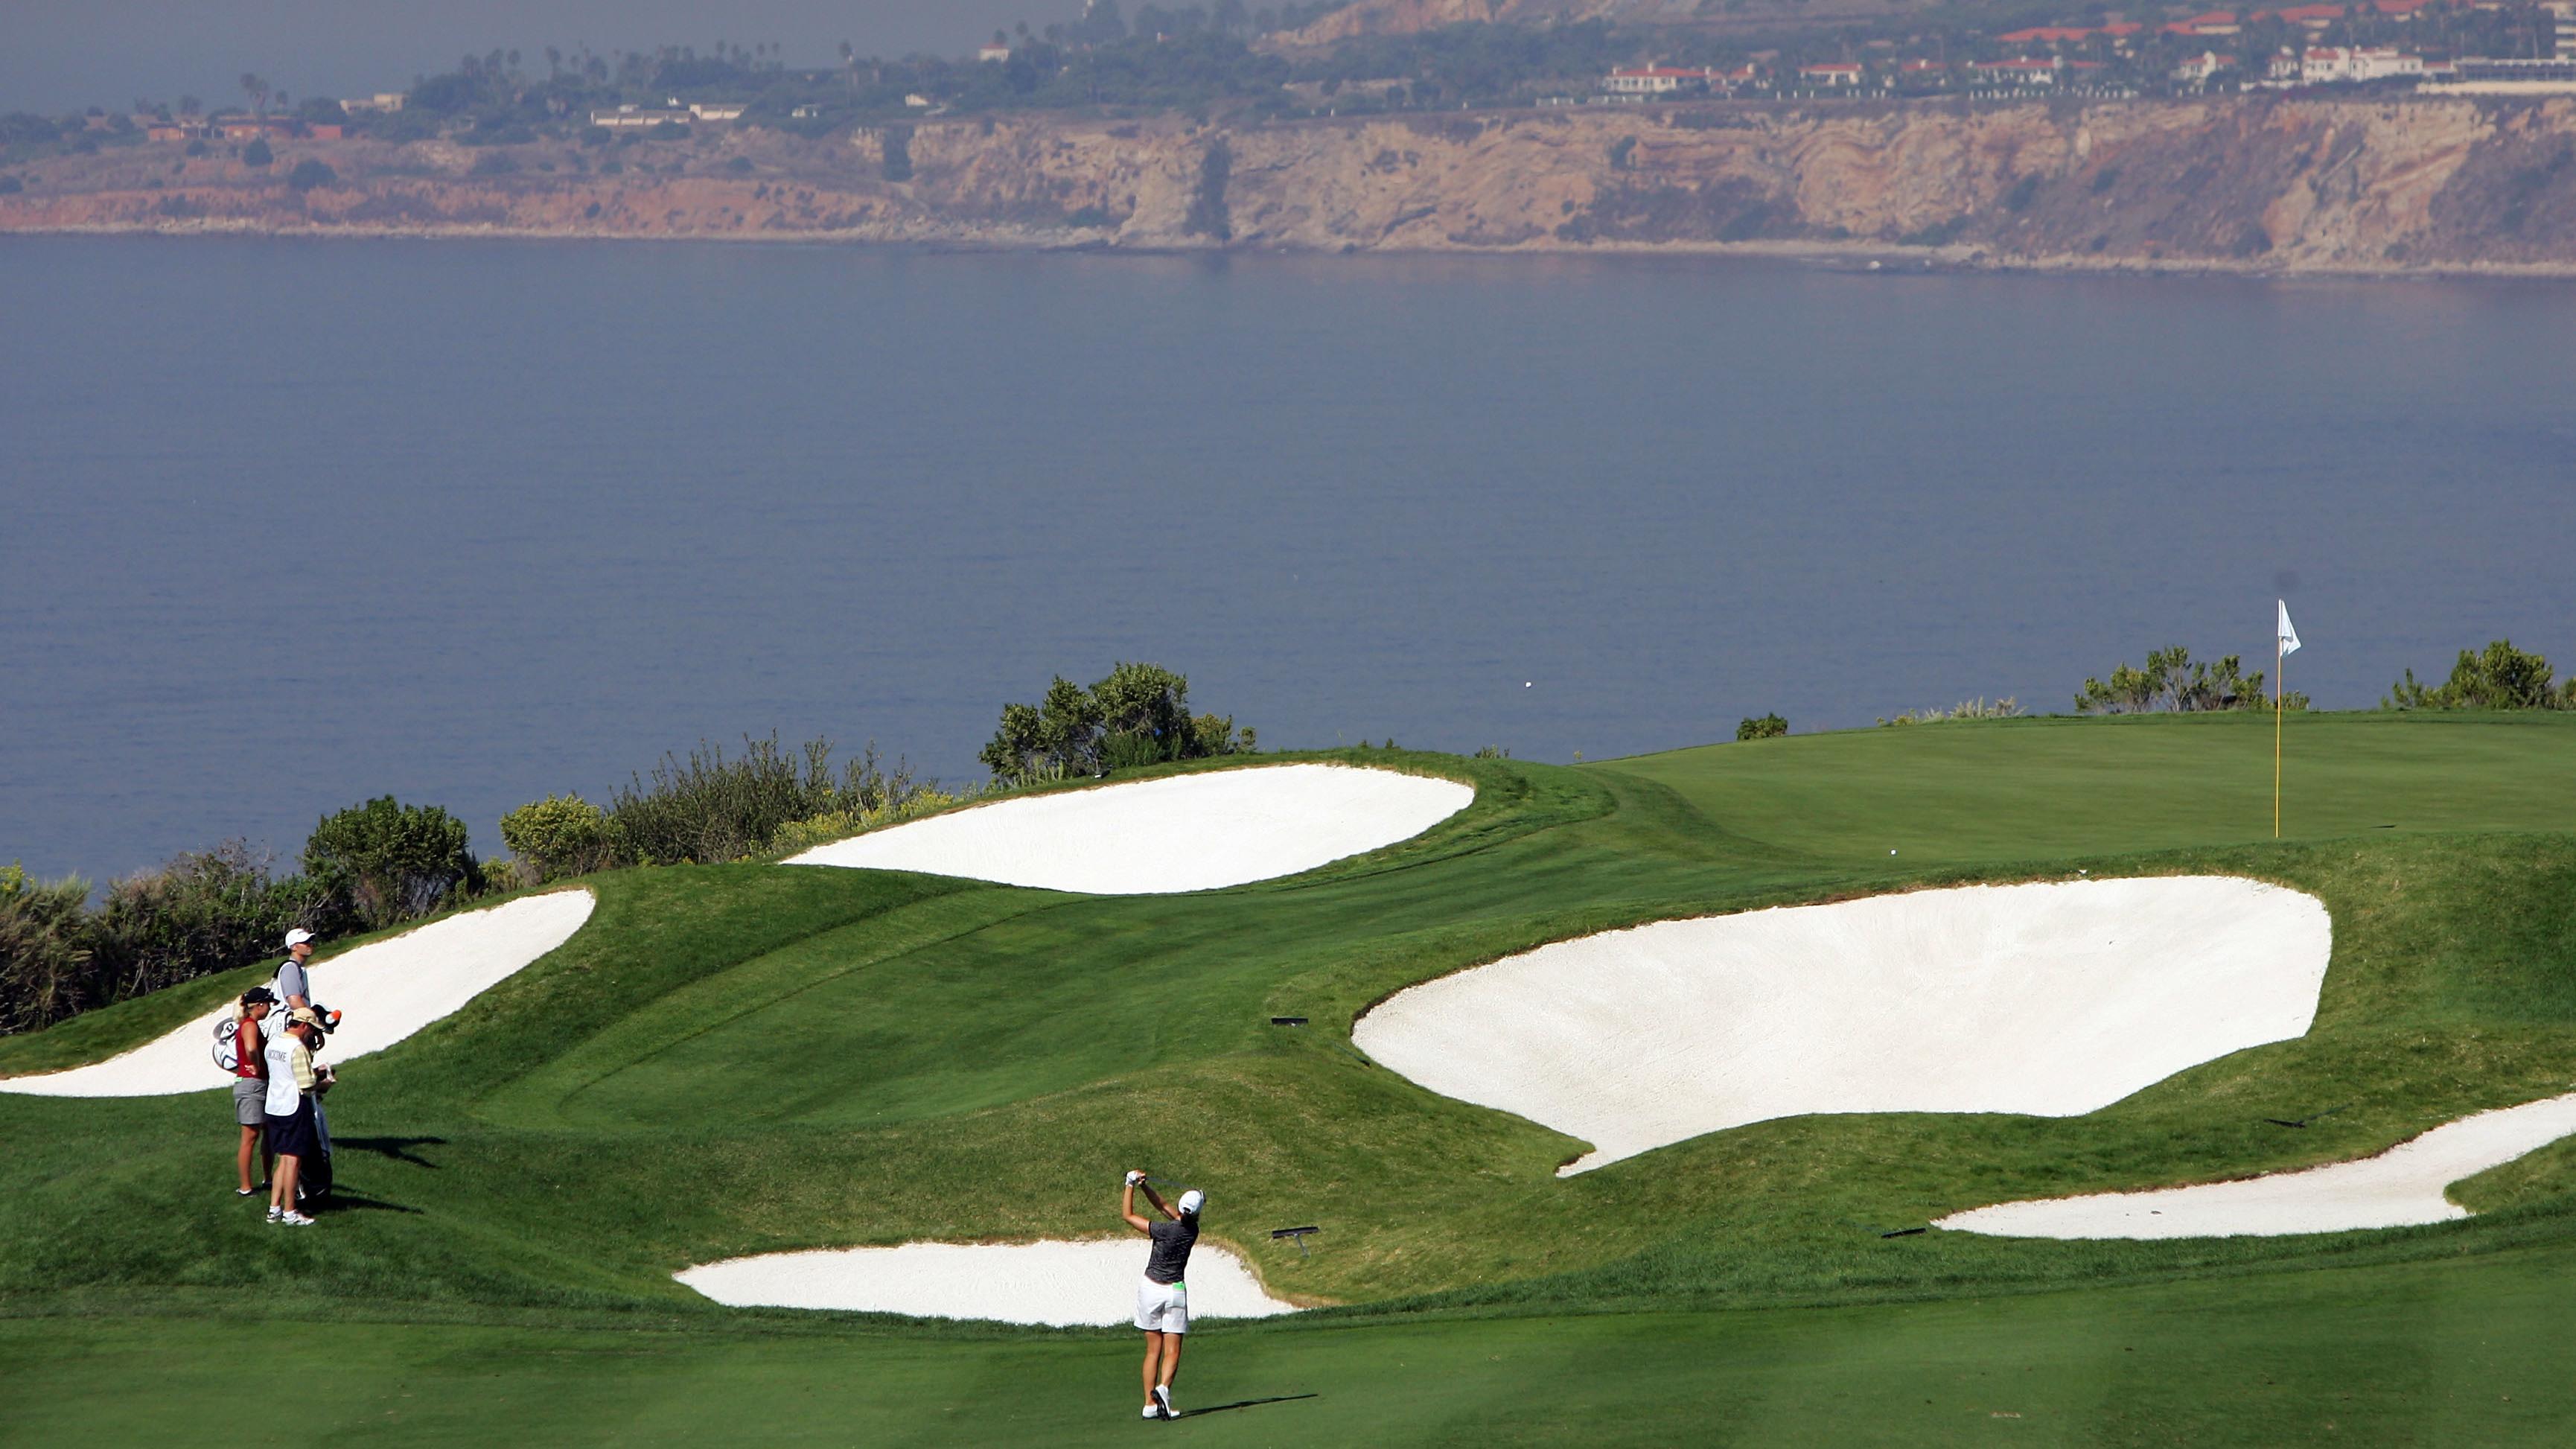 nude bogy art golf landscape was paying